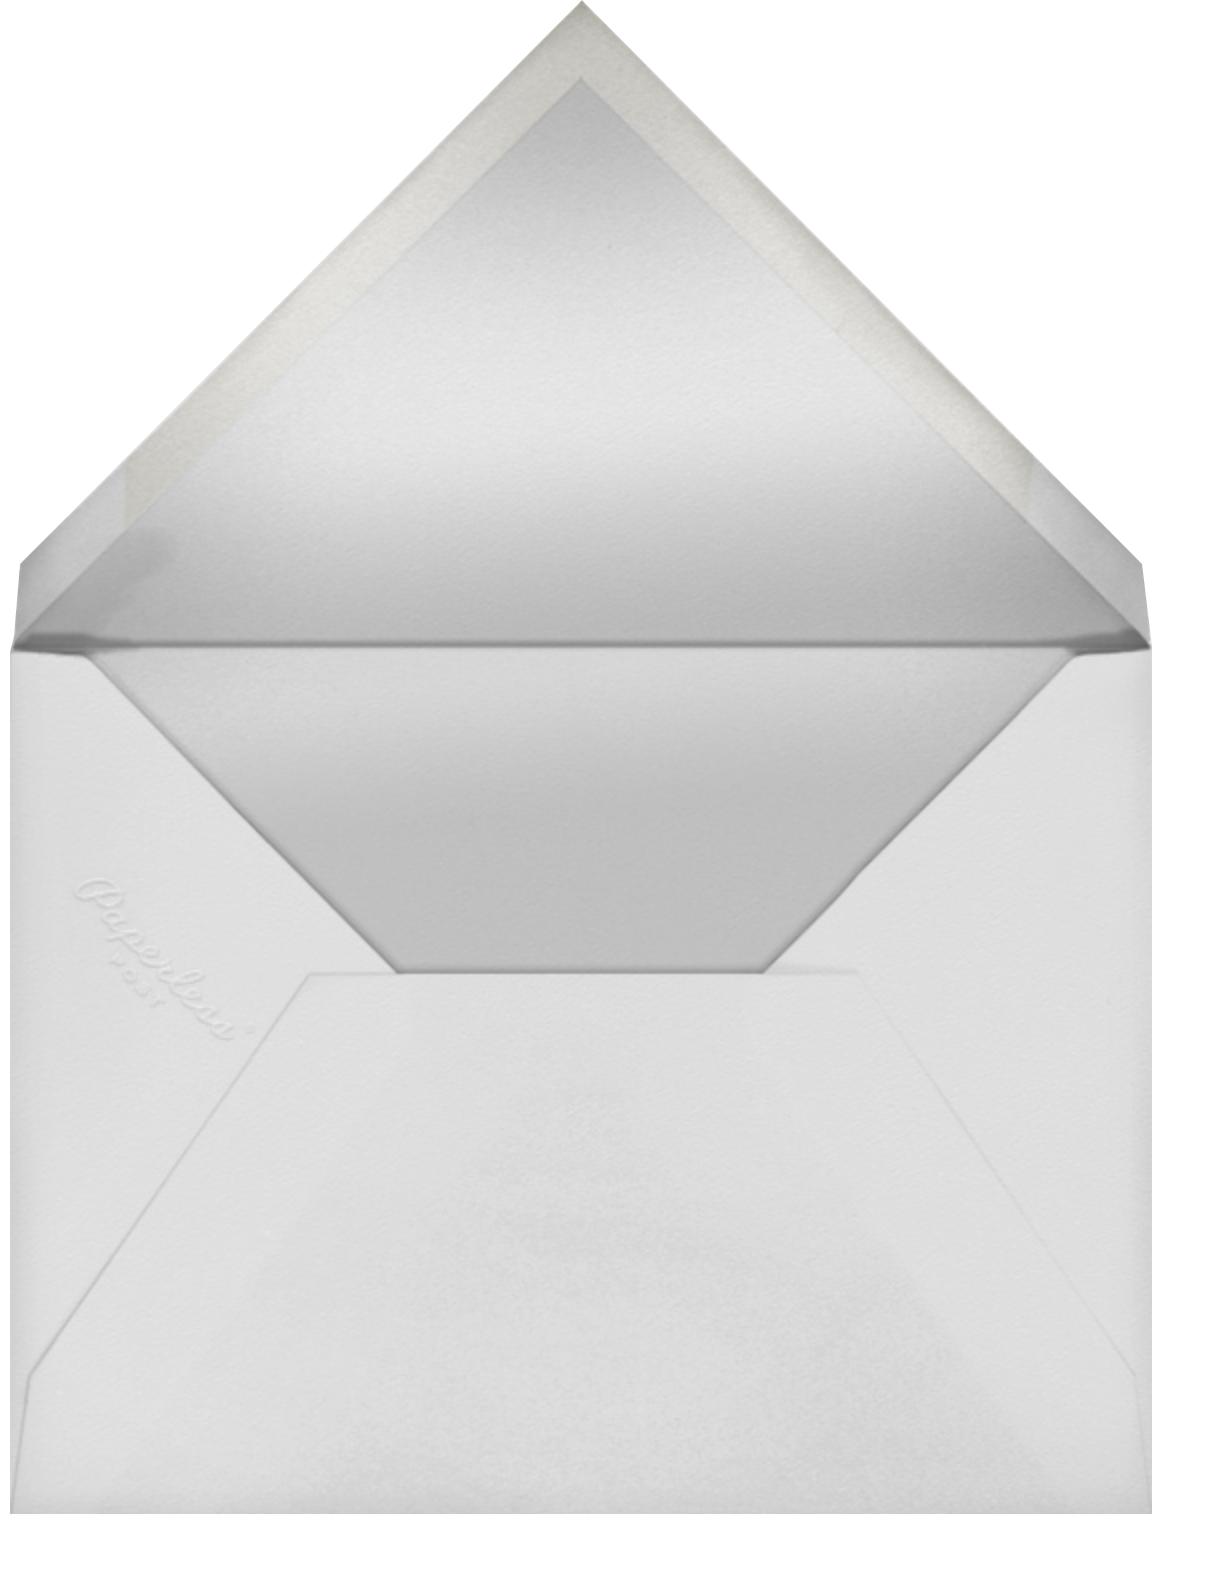 Dandelion Harvest (Menu) - Happy Menocal - Menus - envelope back